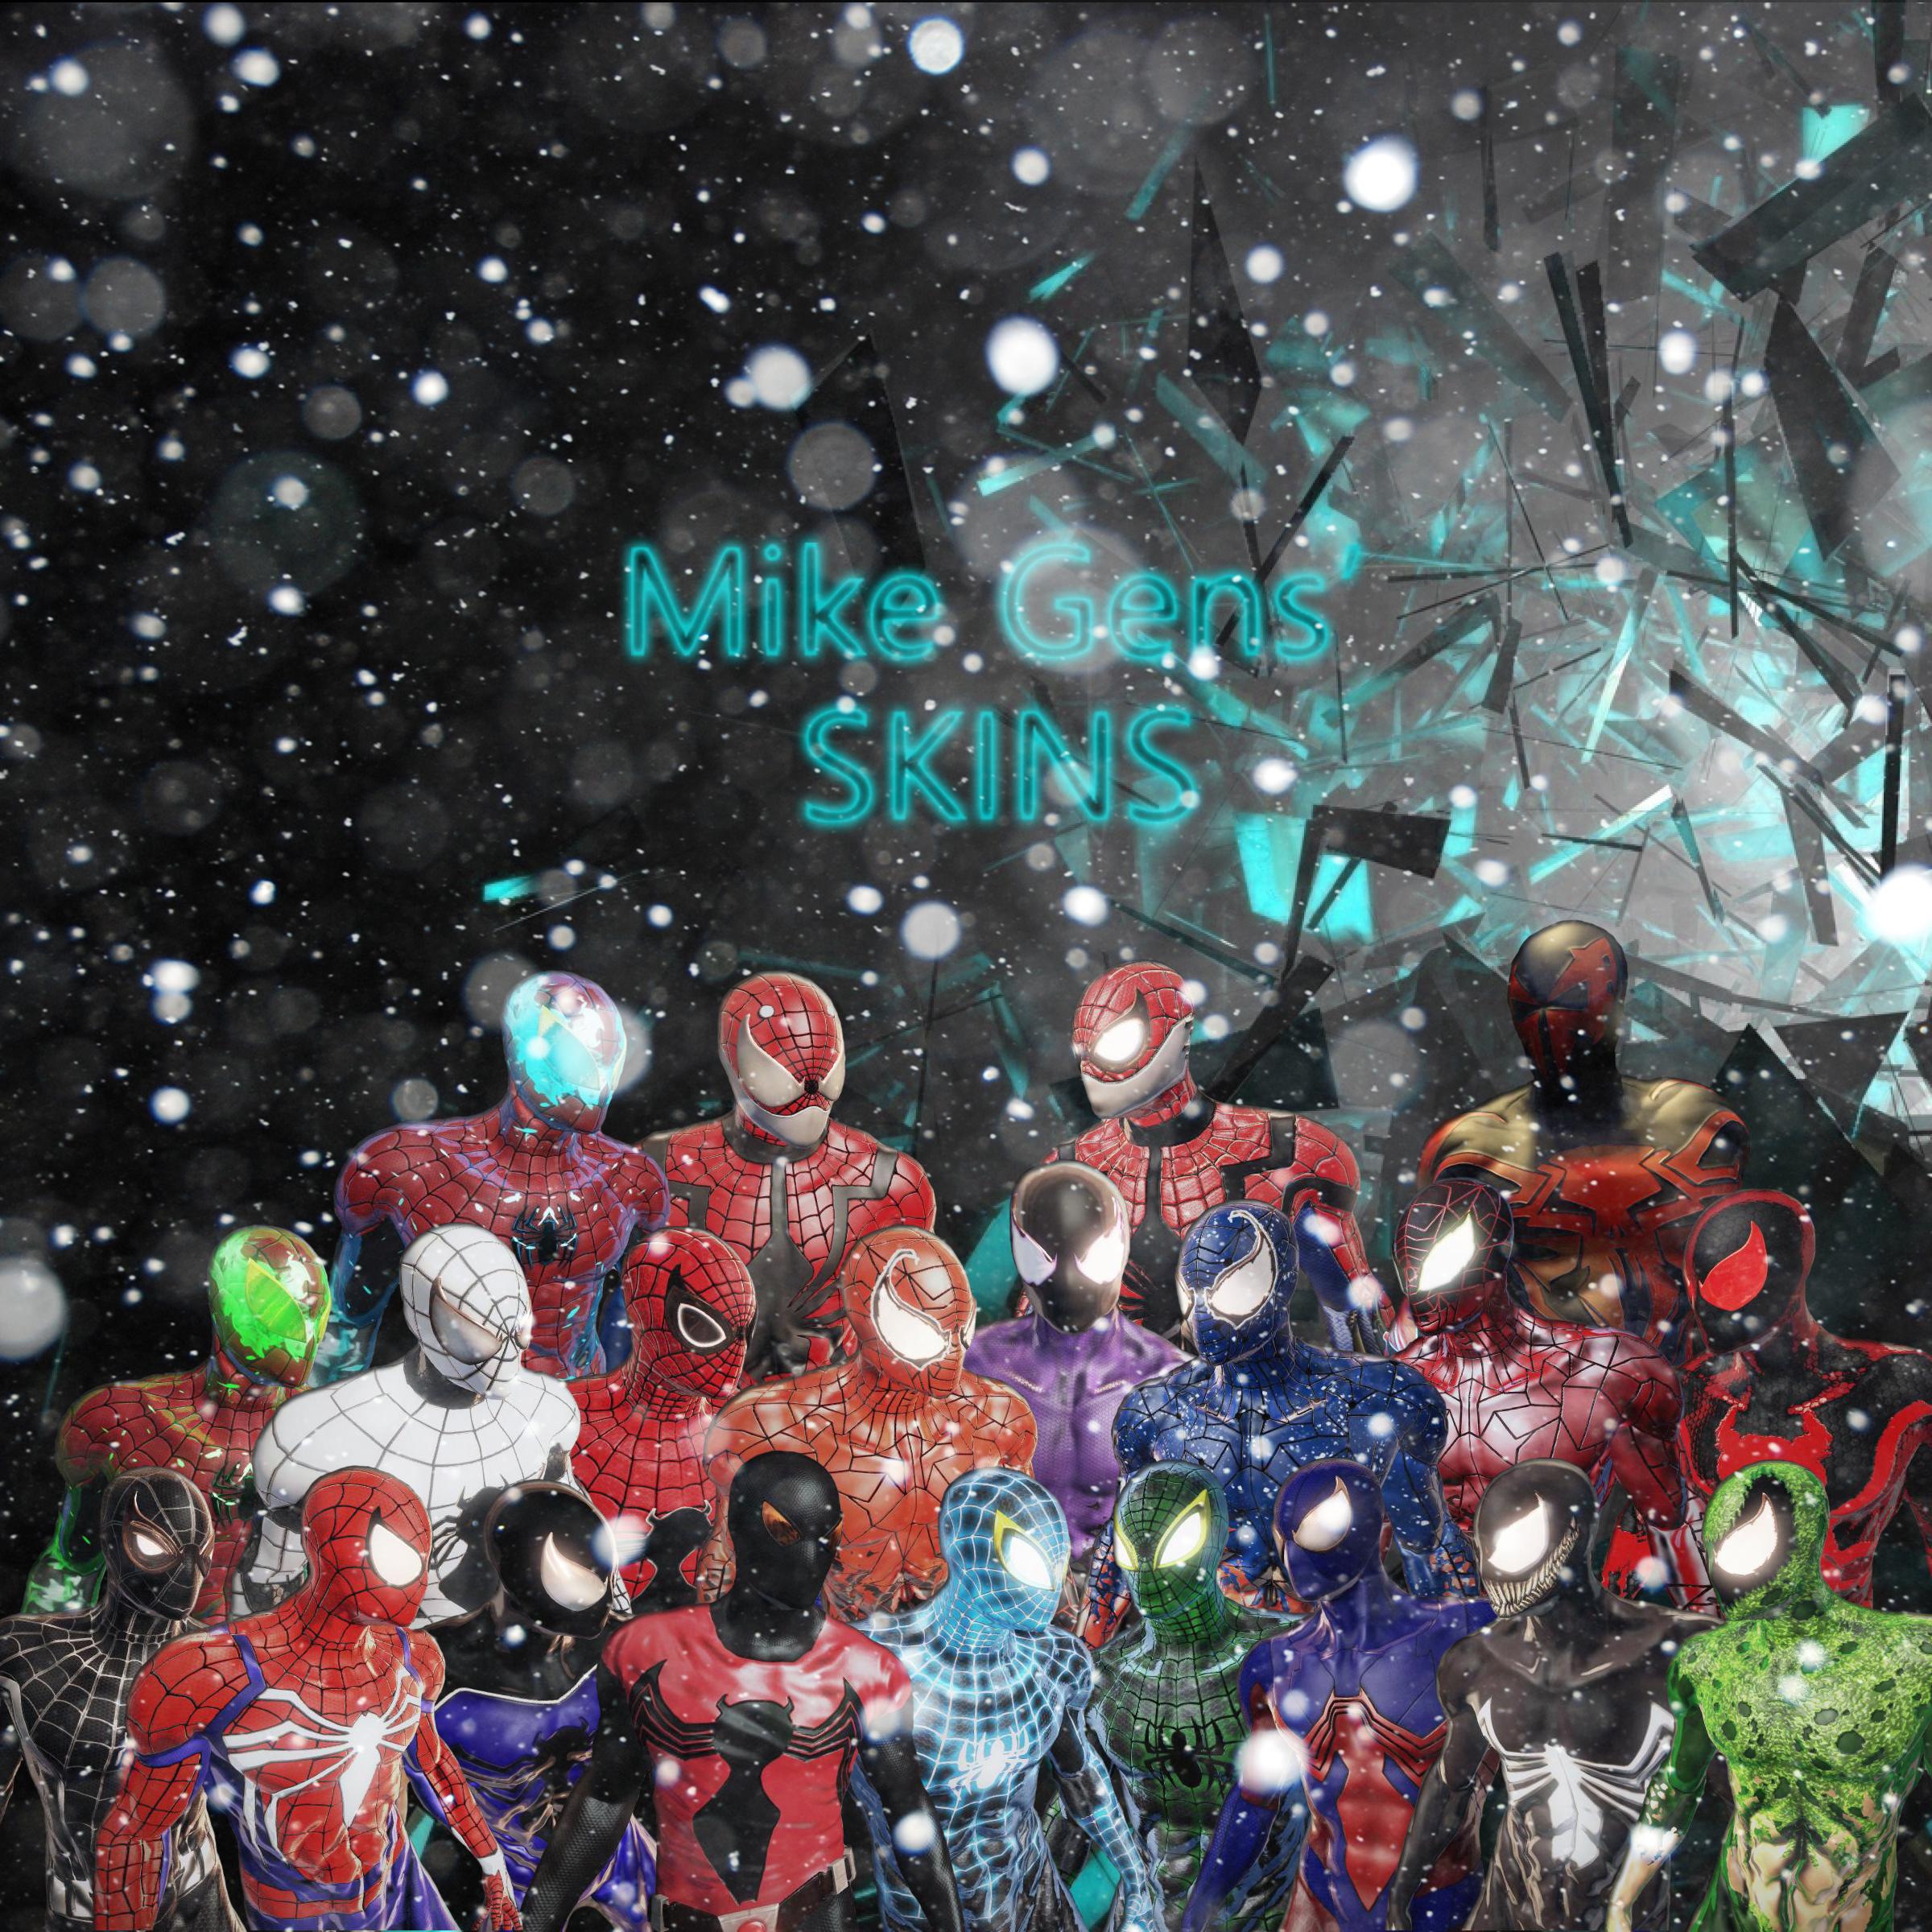 Авка.jpg - Amazing Spider-Man 2, the Mike Gens, Mike Gens' Skins, TASM, TASM2, Скин